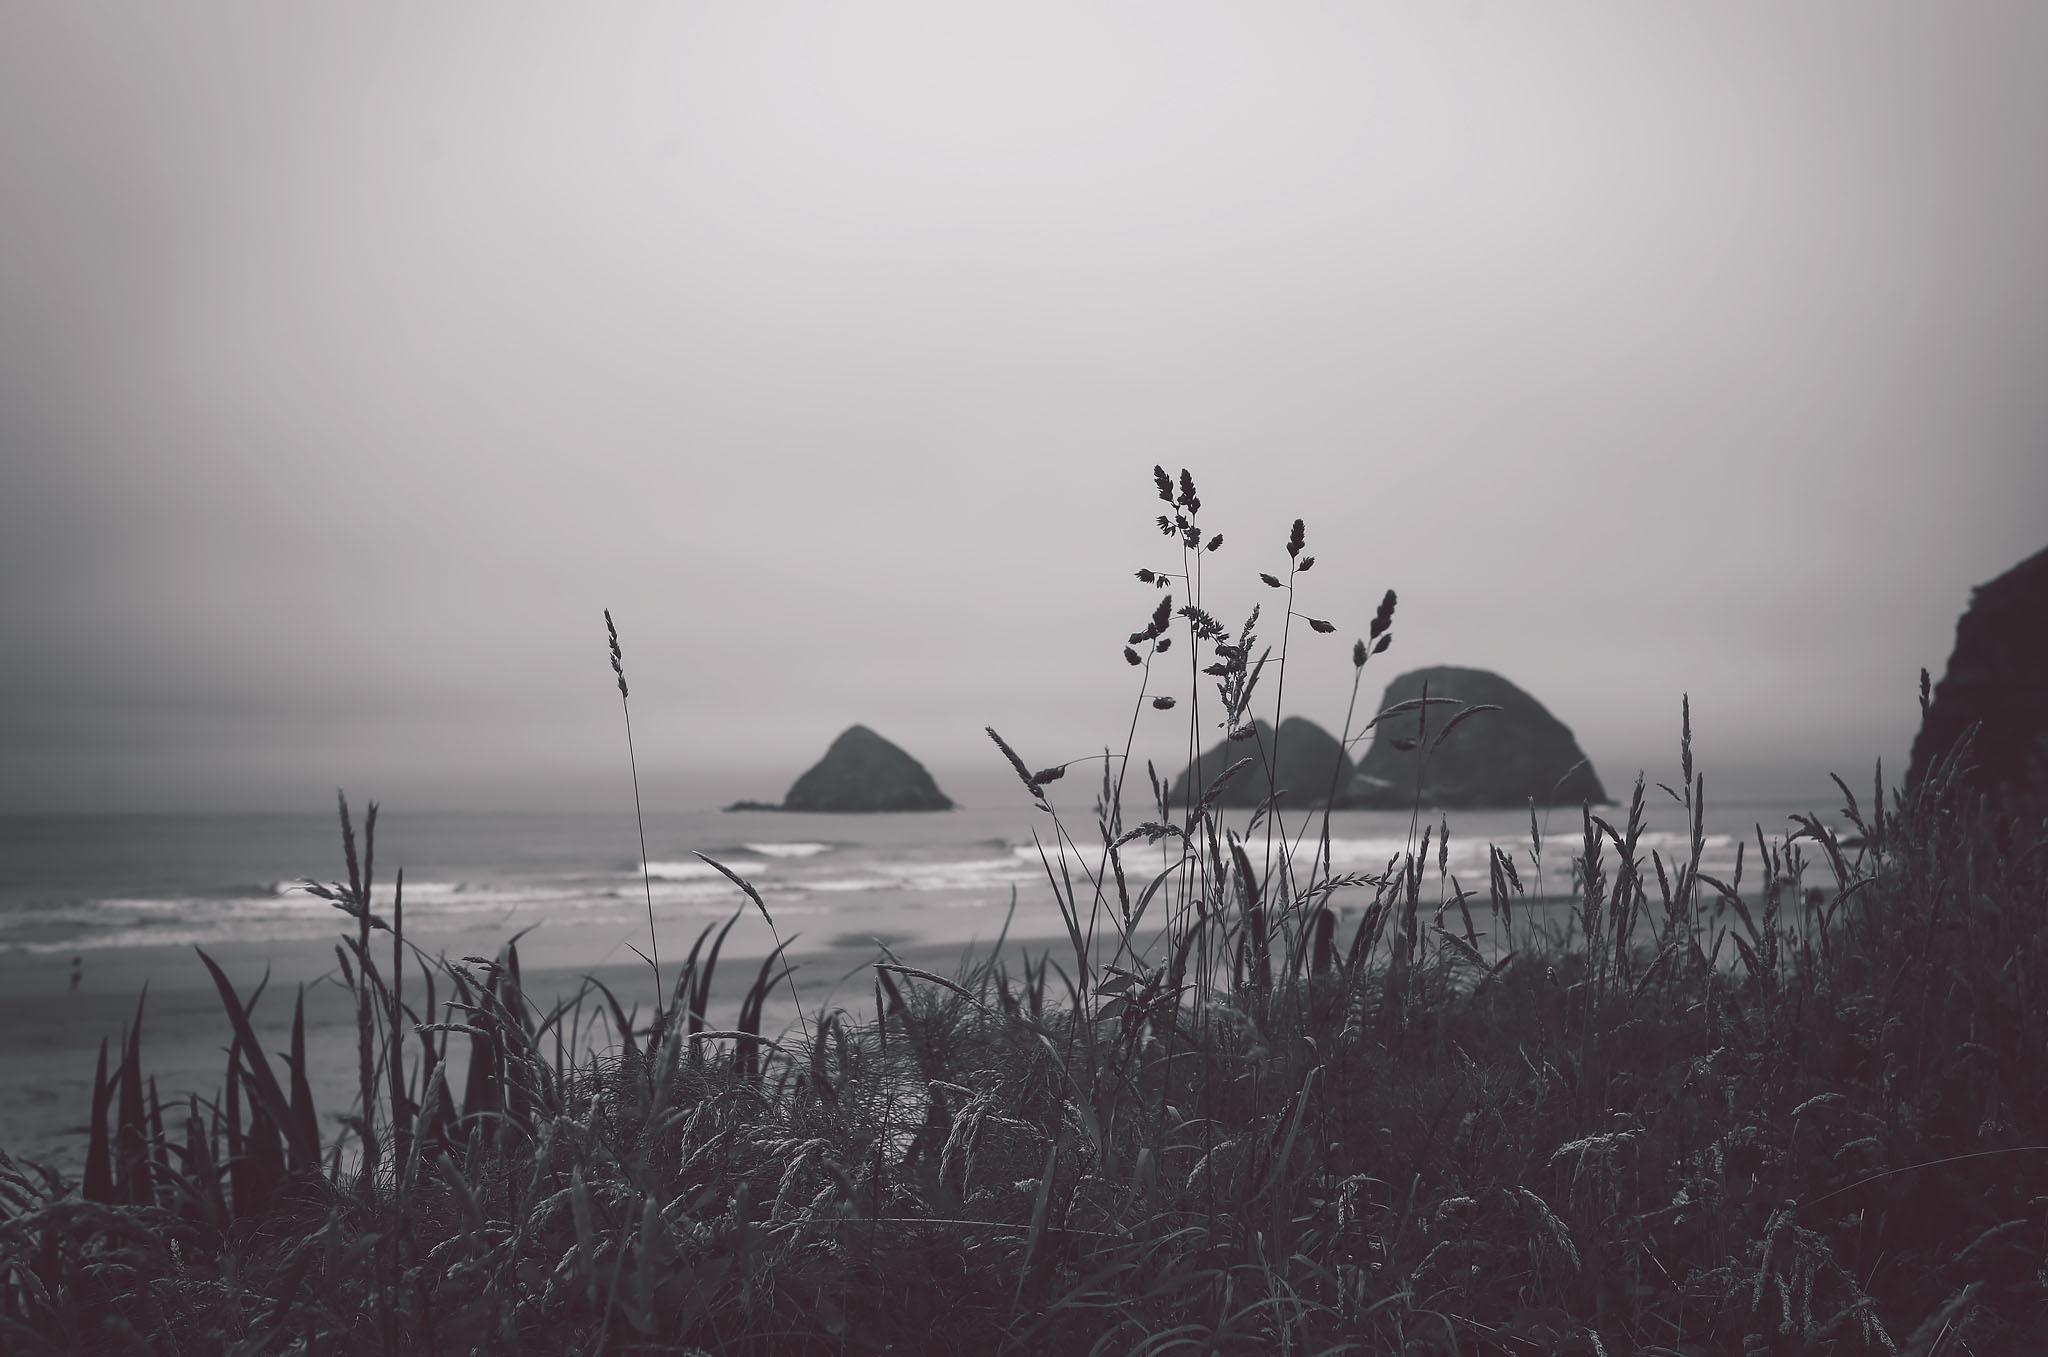 oregon coast, black and white series, jennifer picard photography, travel photography